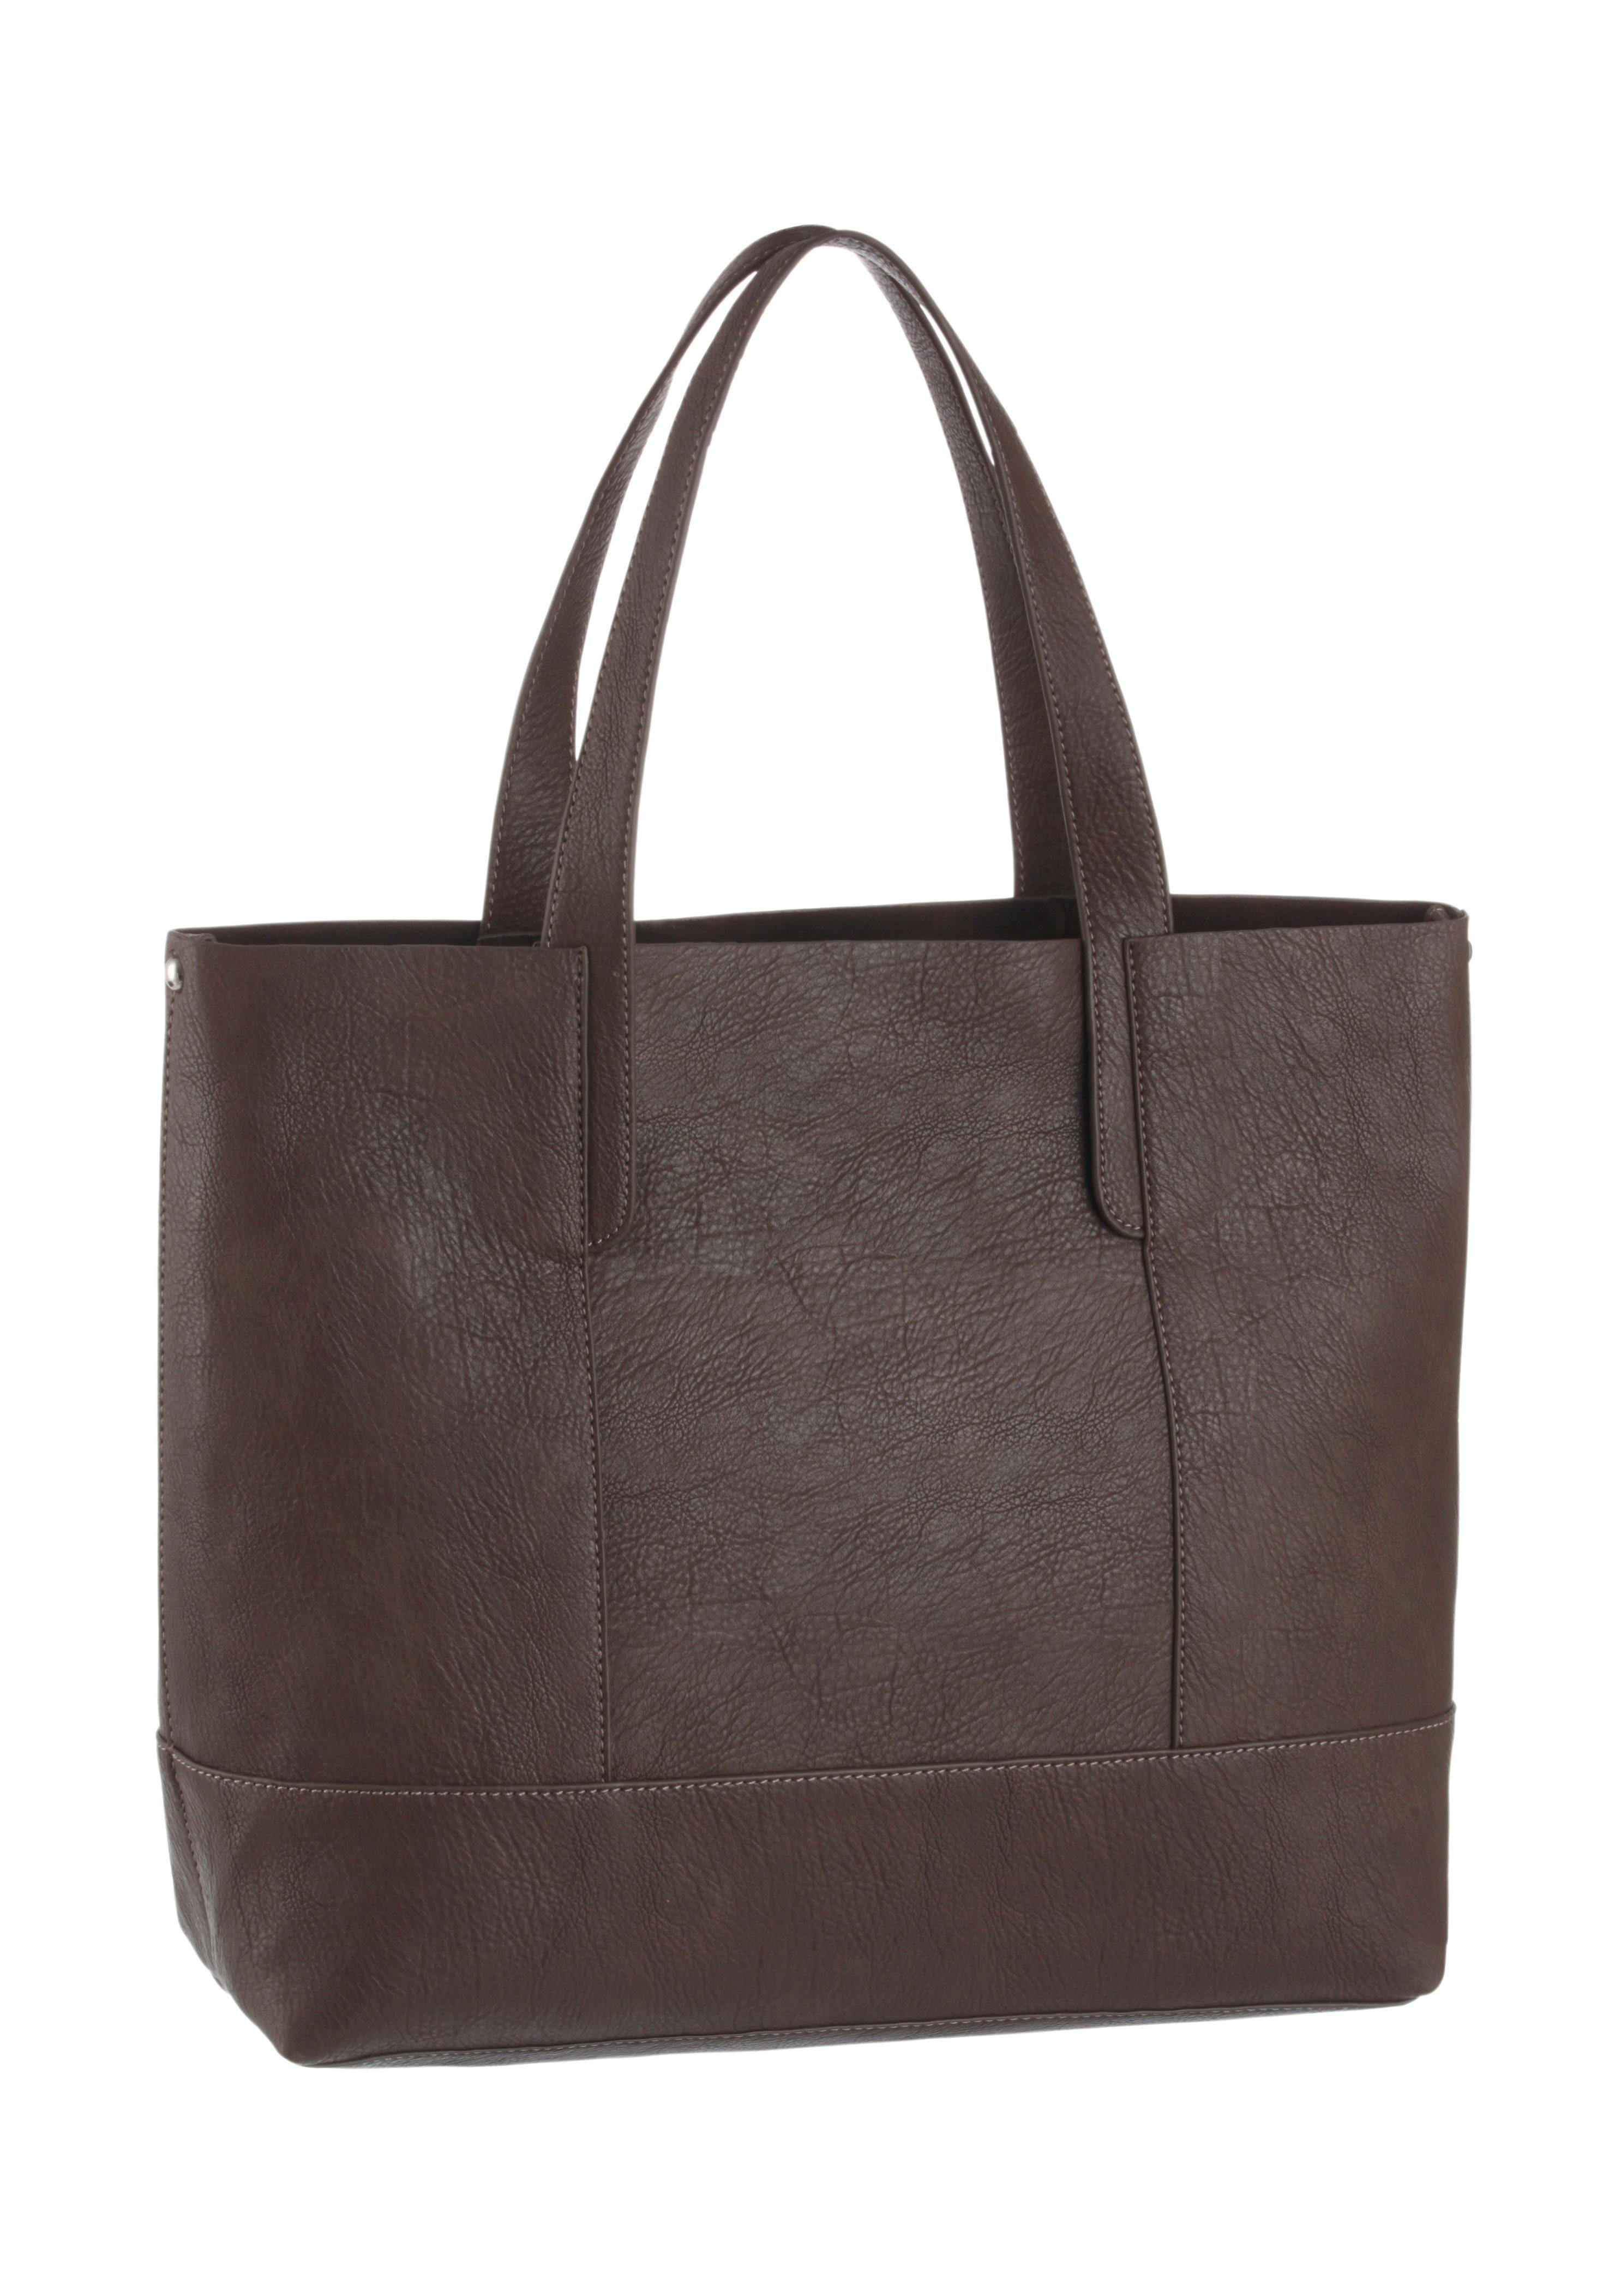 Arizona Shopper mit herausnehmbarer Tasche